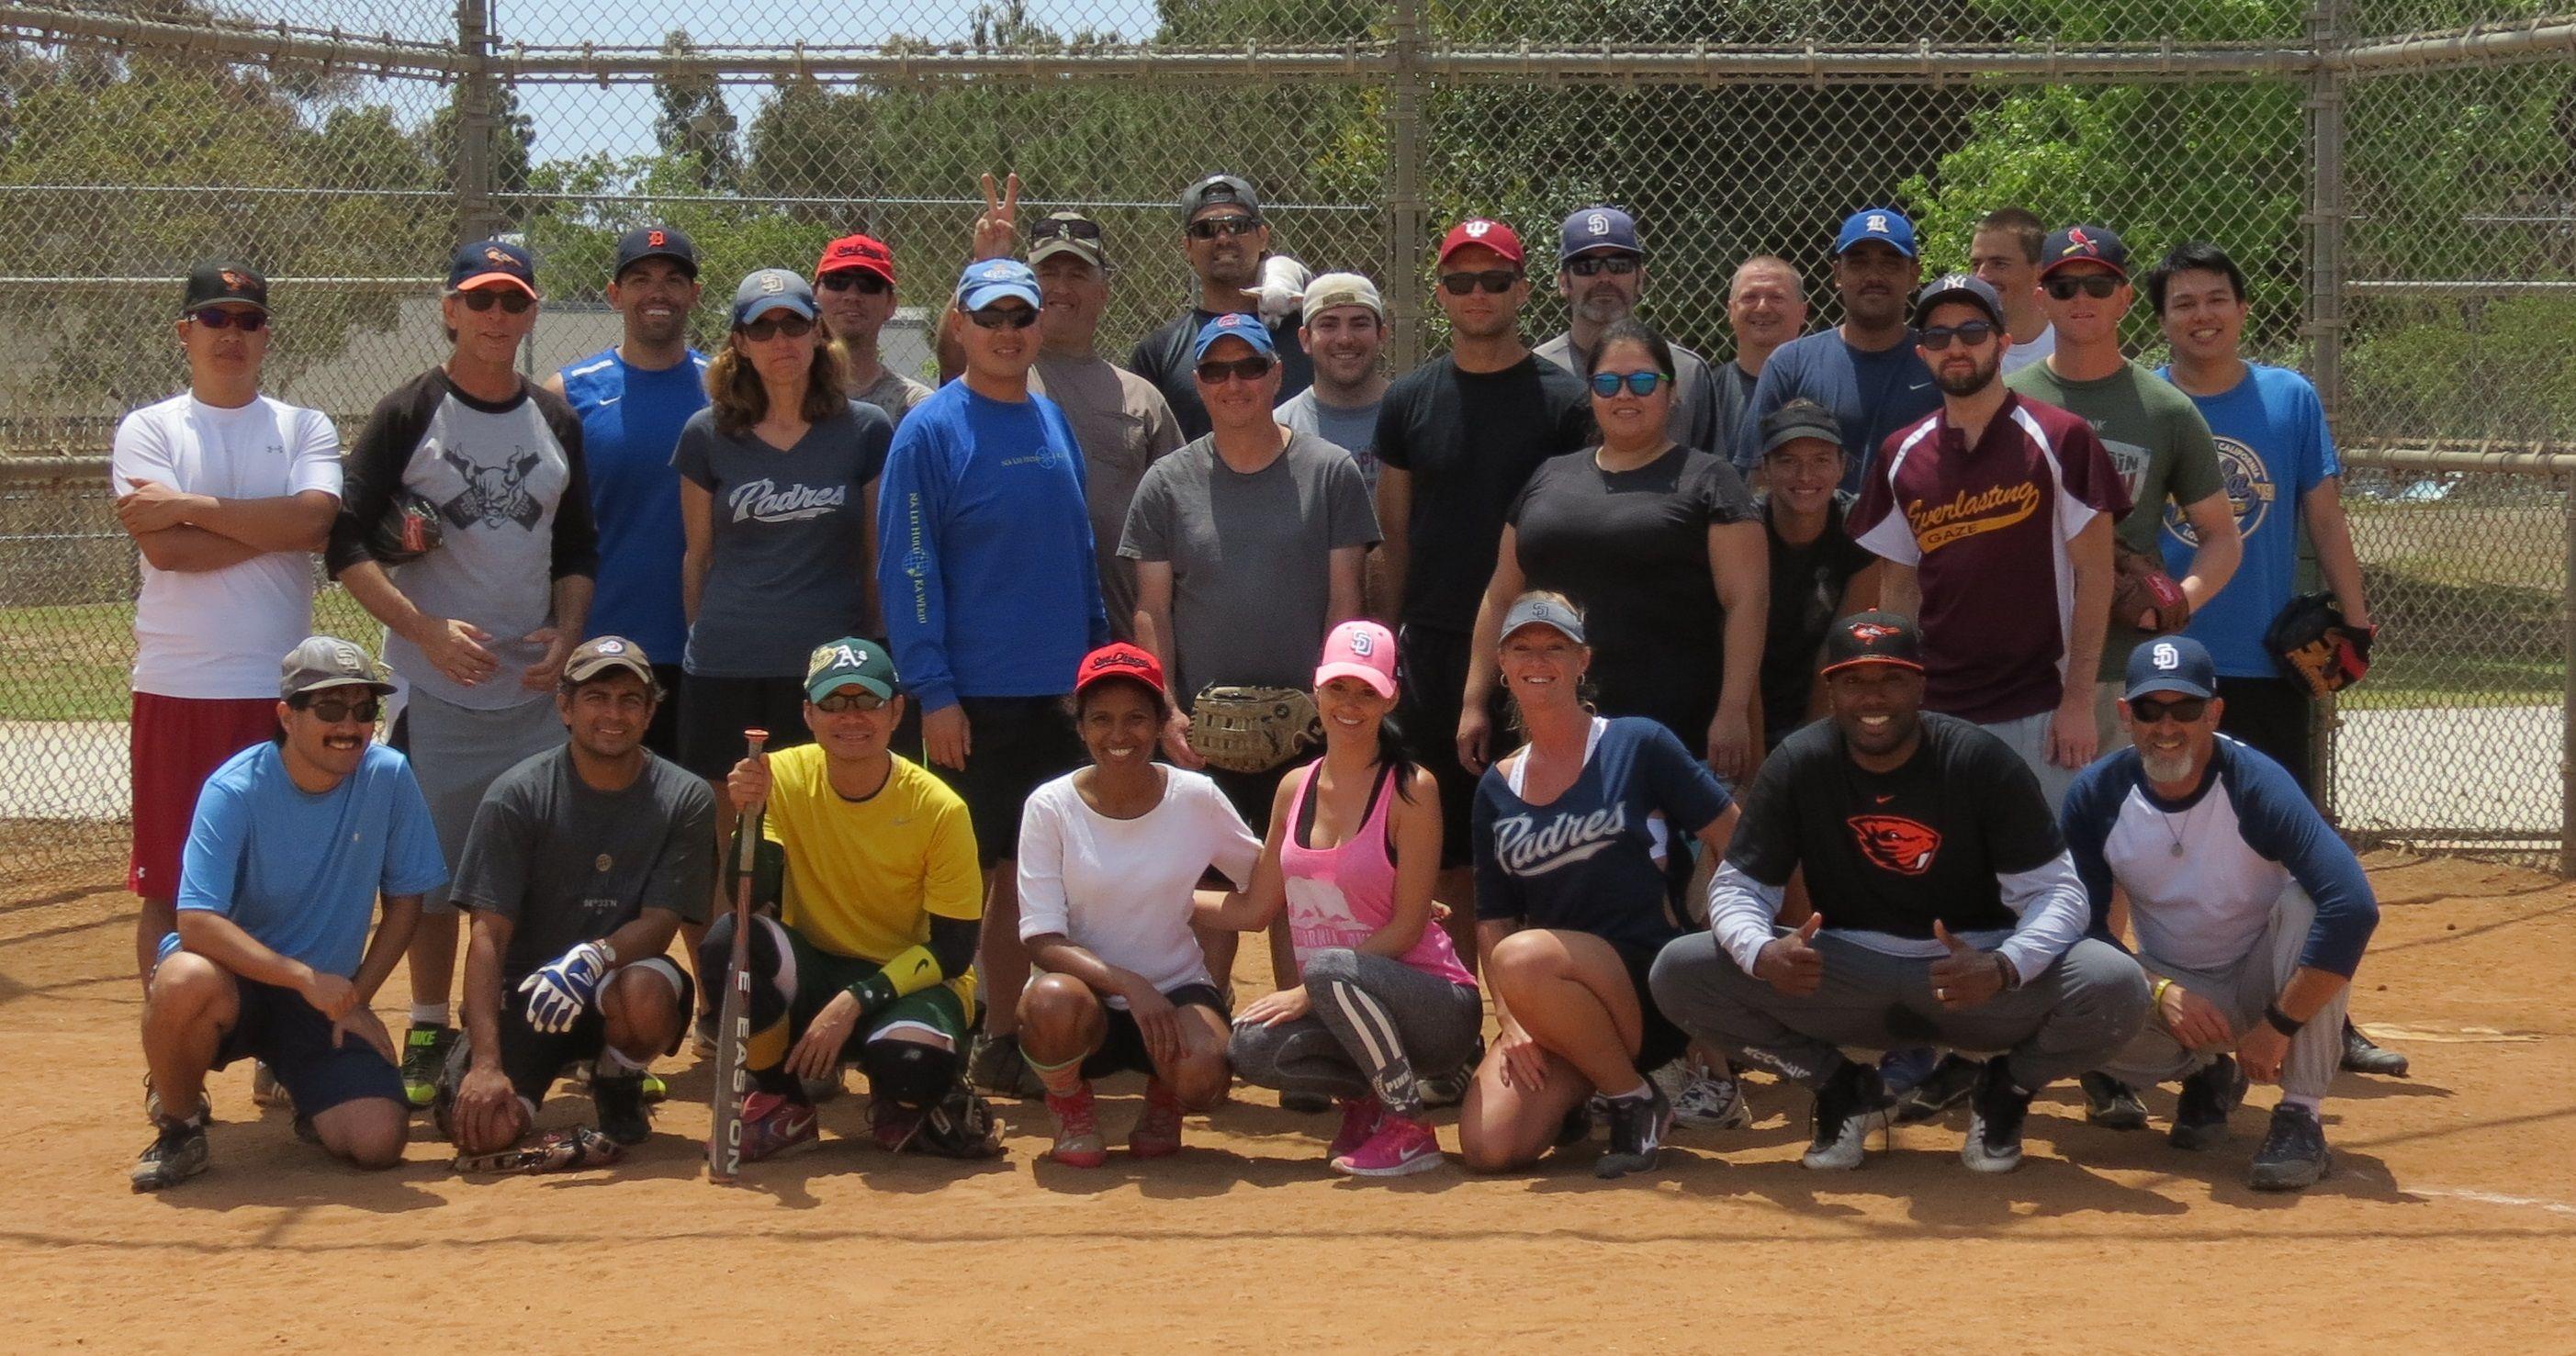 San Diego Sunday Co-ed Softball - UTC Univers